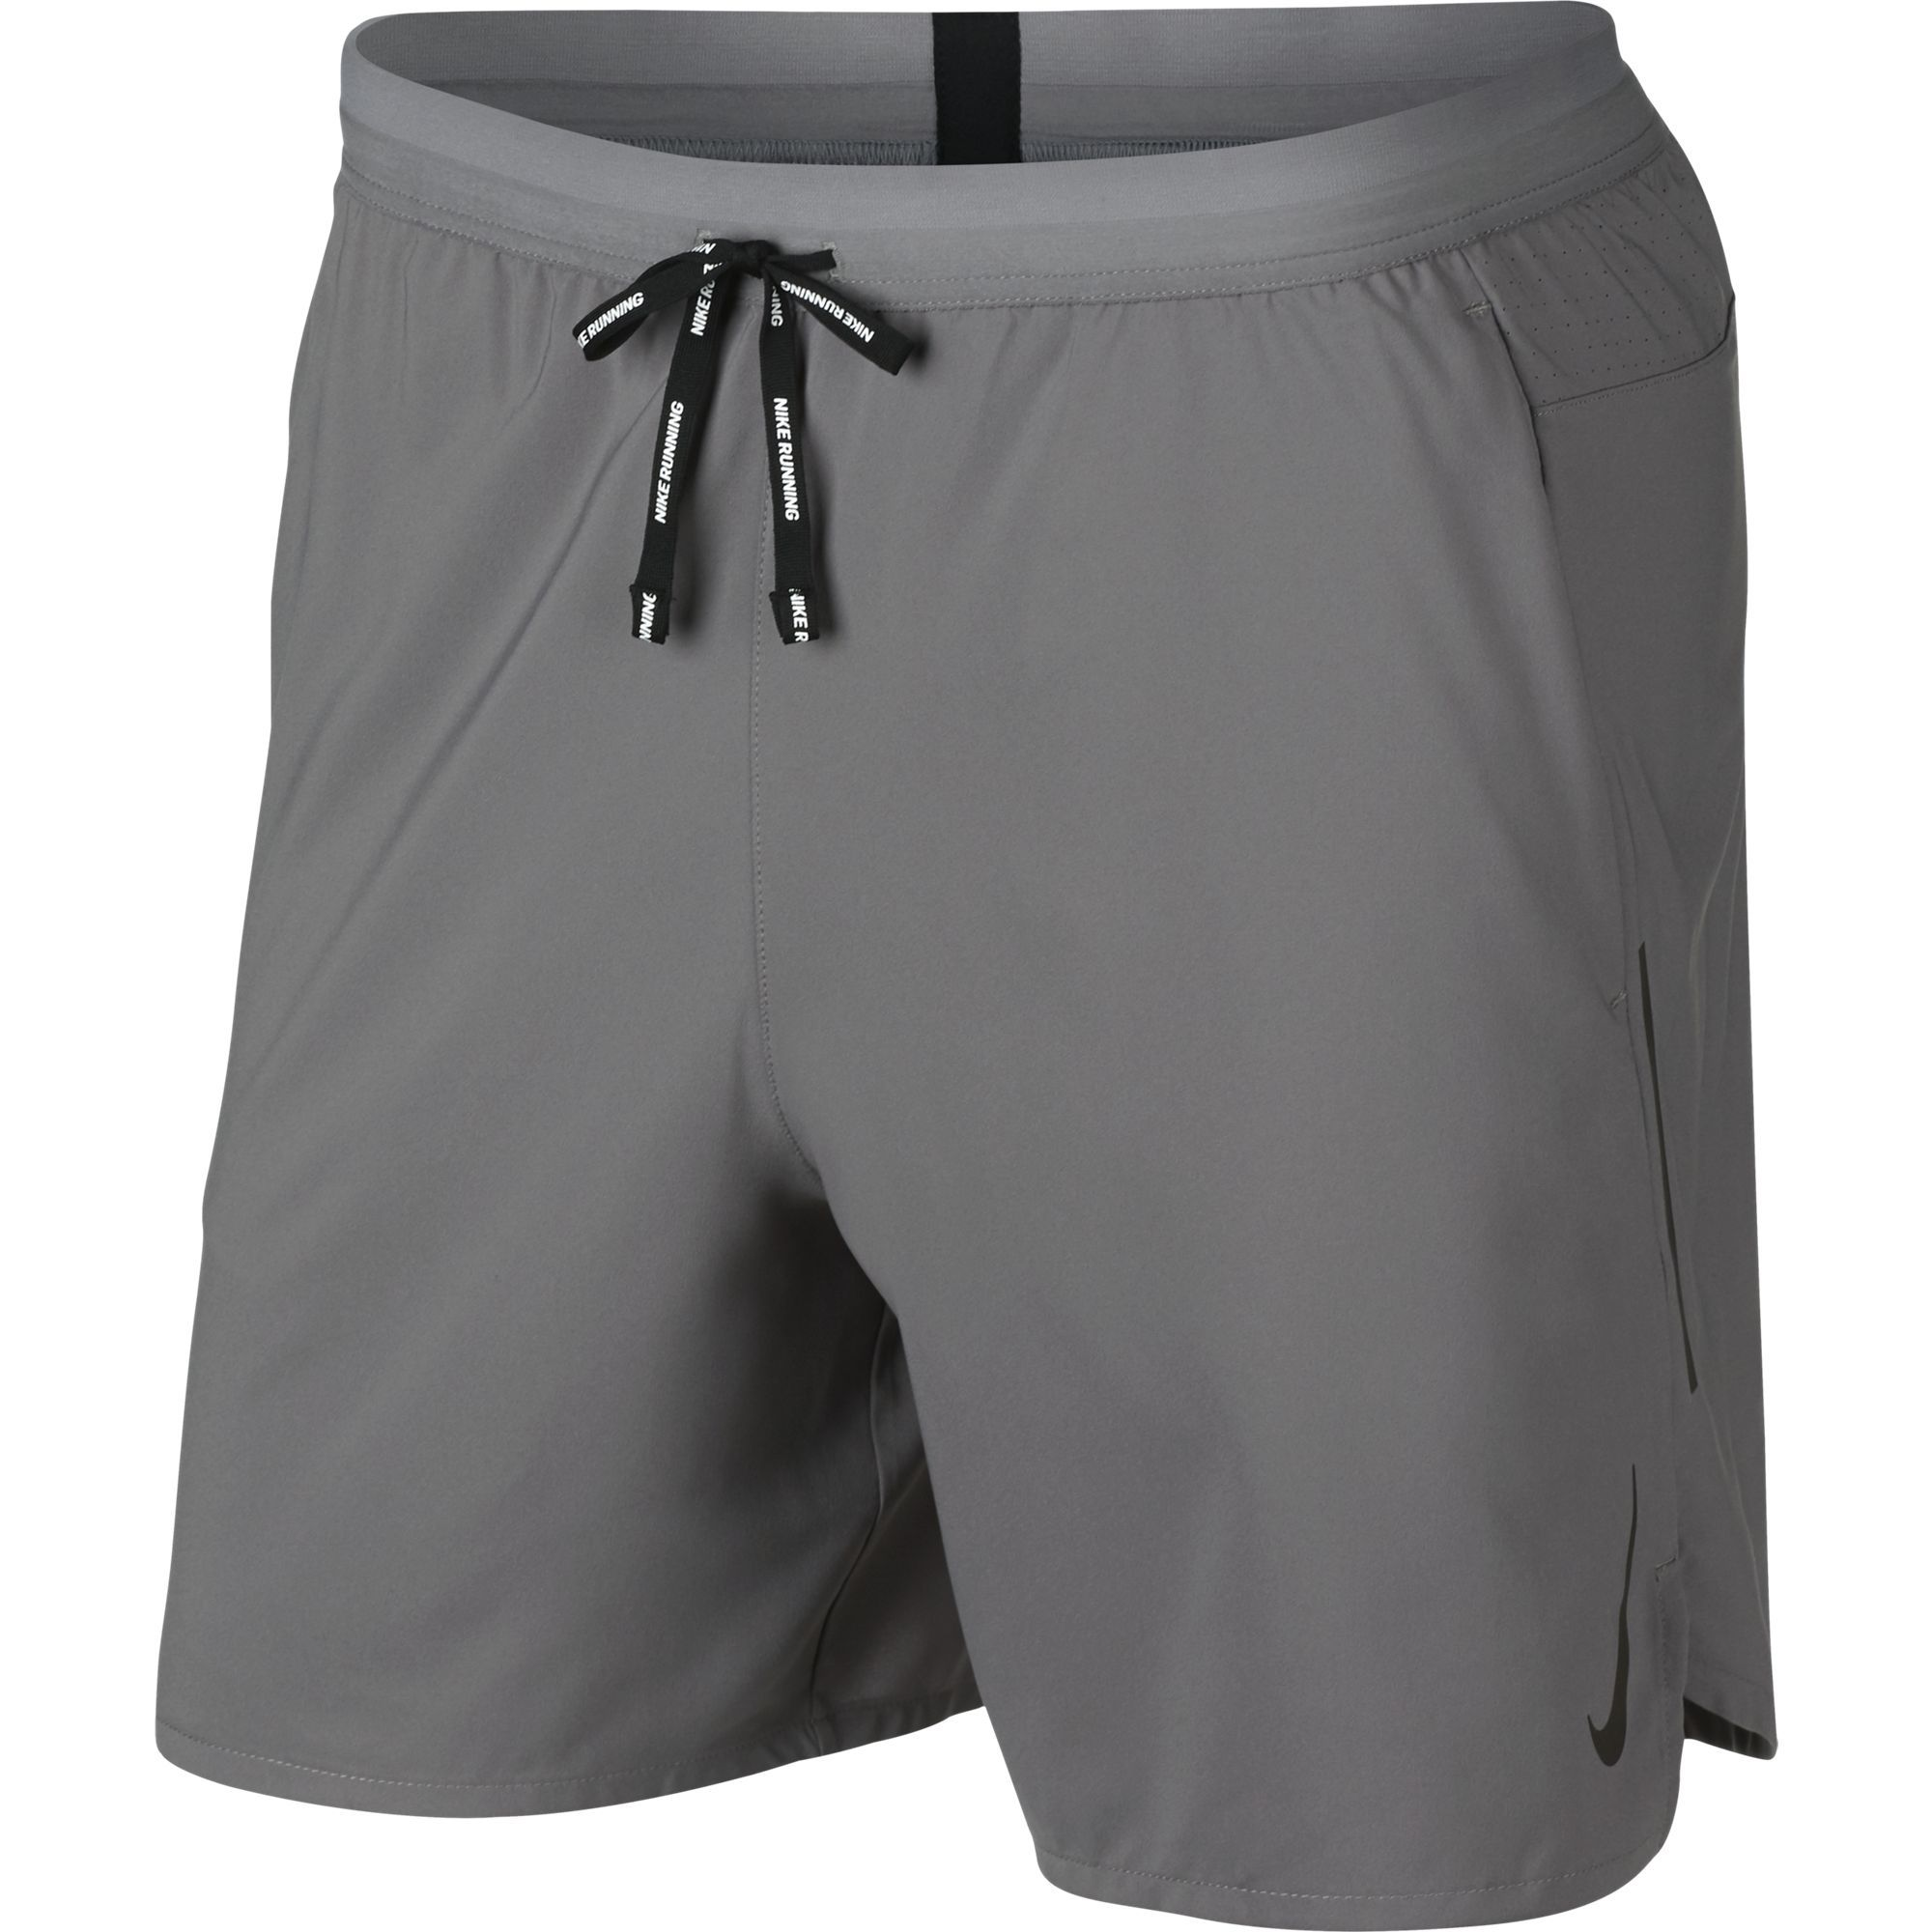 "Nike Flex Stride 2in1 Shorts 7"" in Grau"